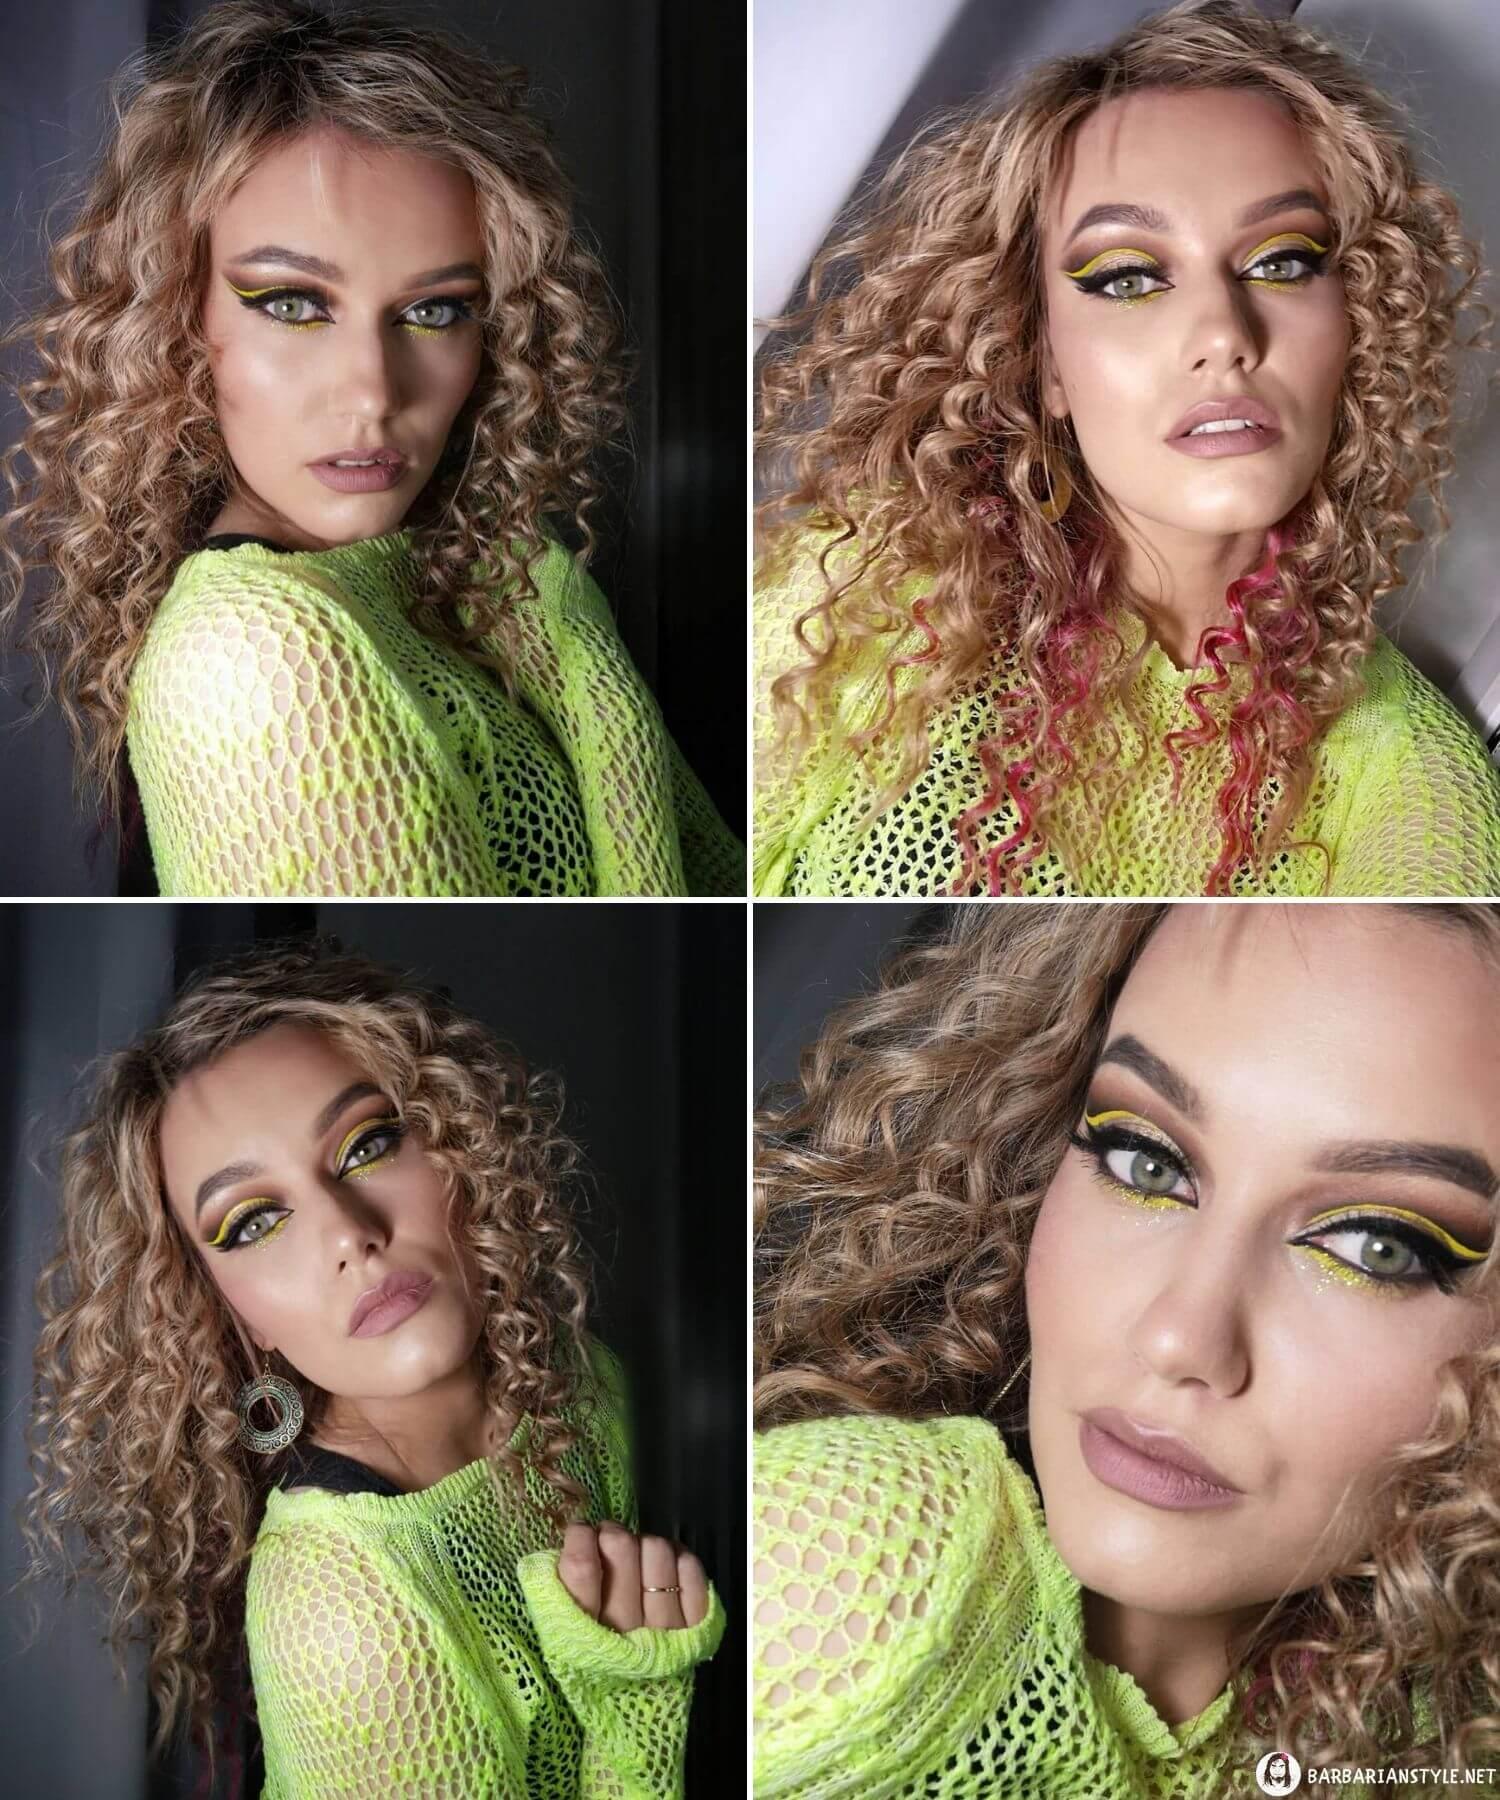 Medium-Length Haircut for Girls with Curled Hair